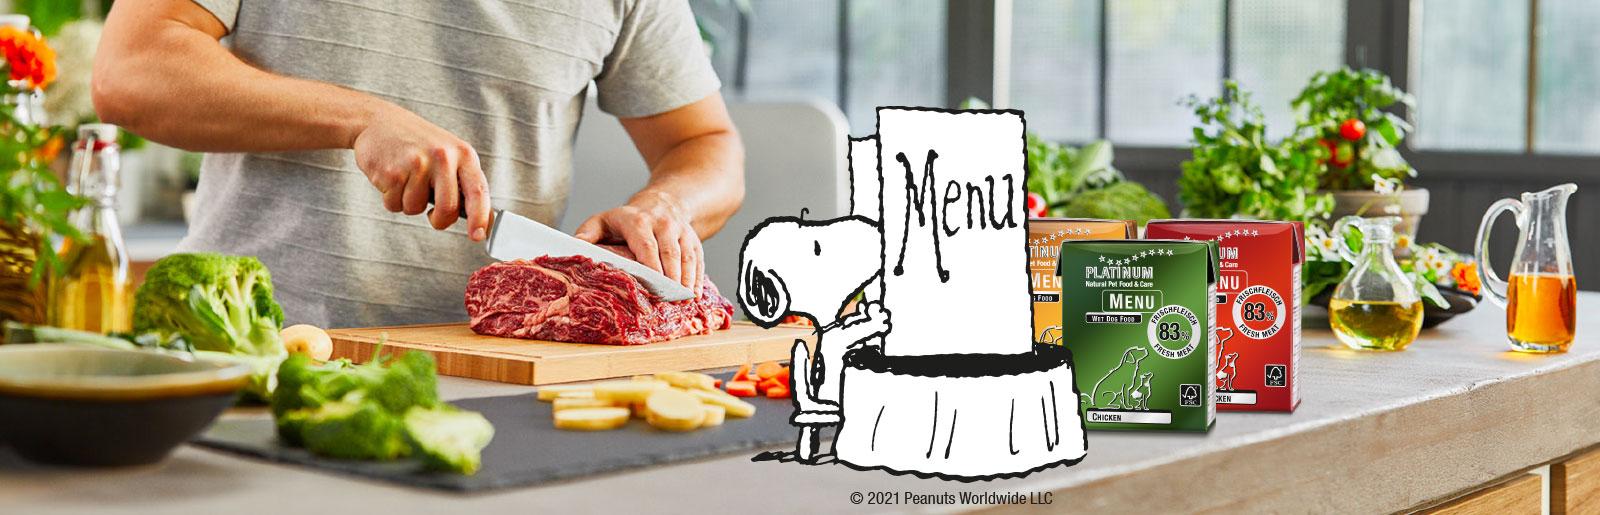 Not for vegetarians